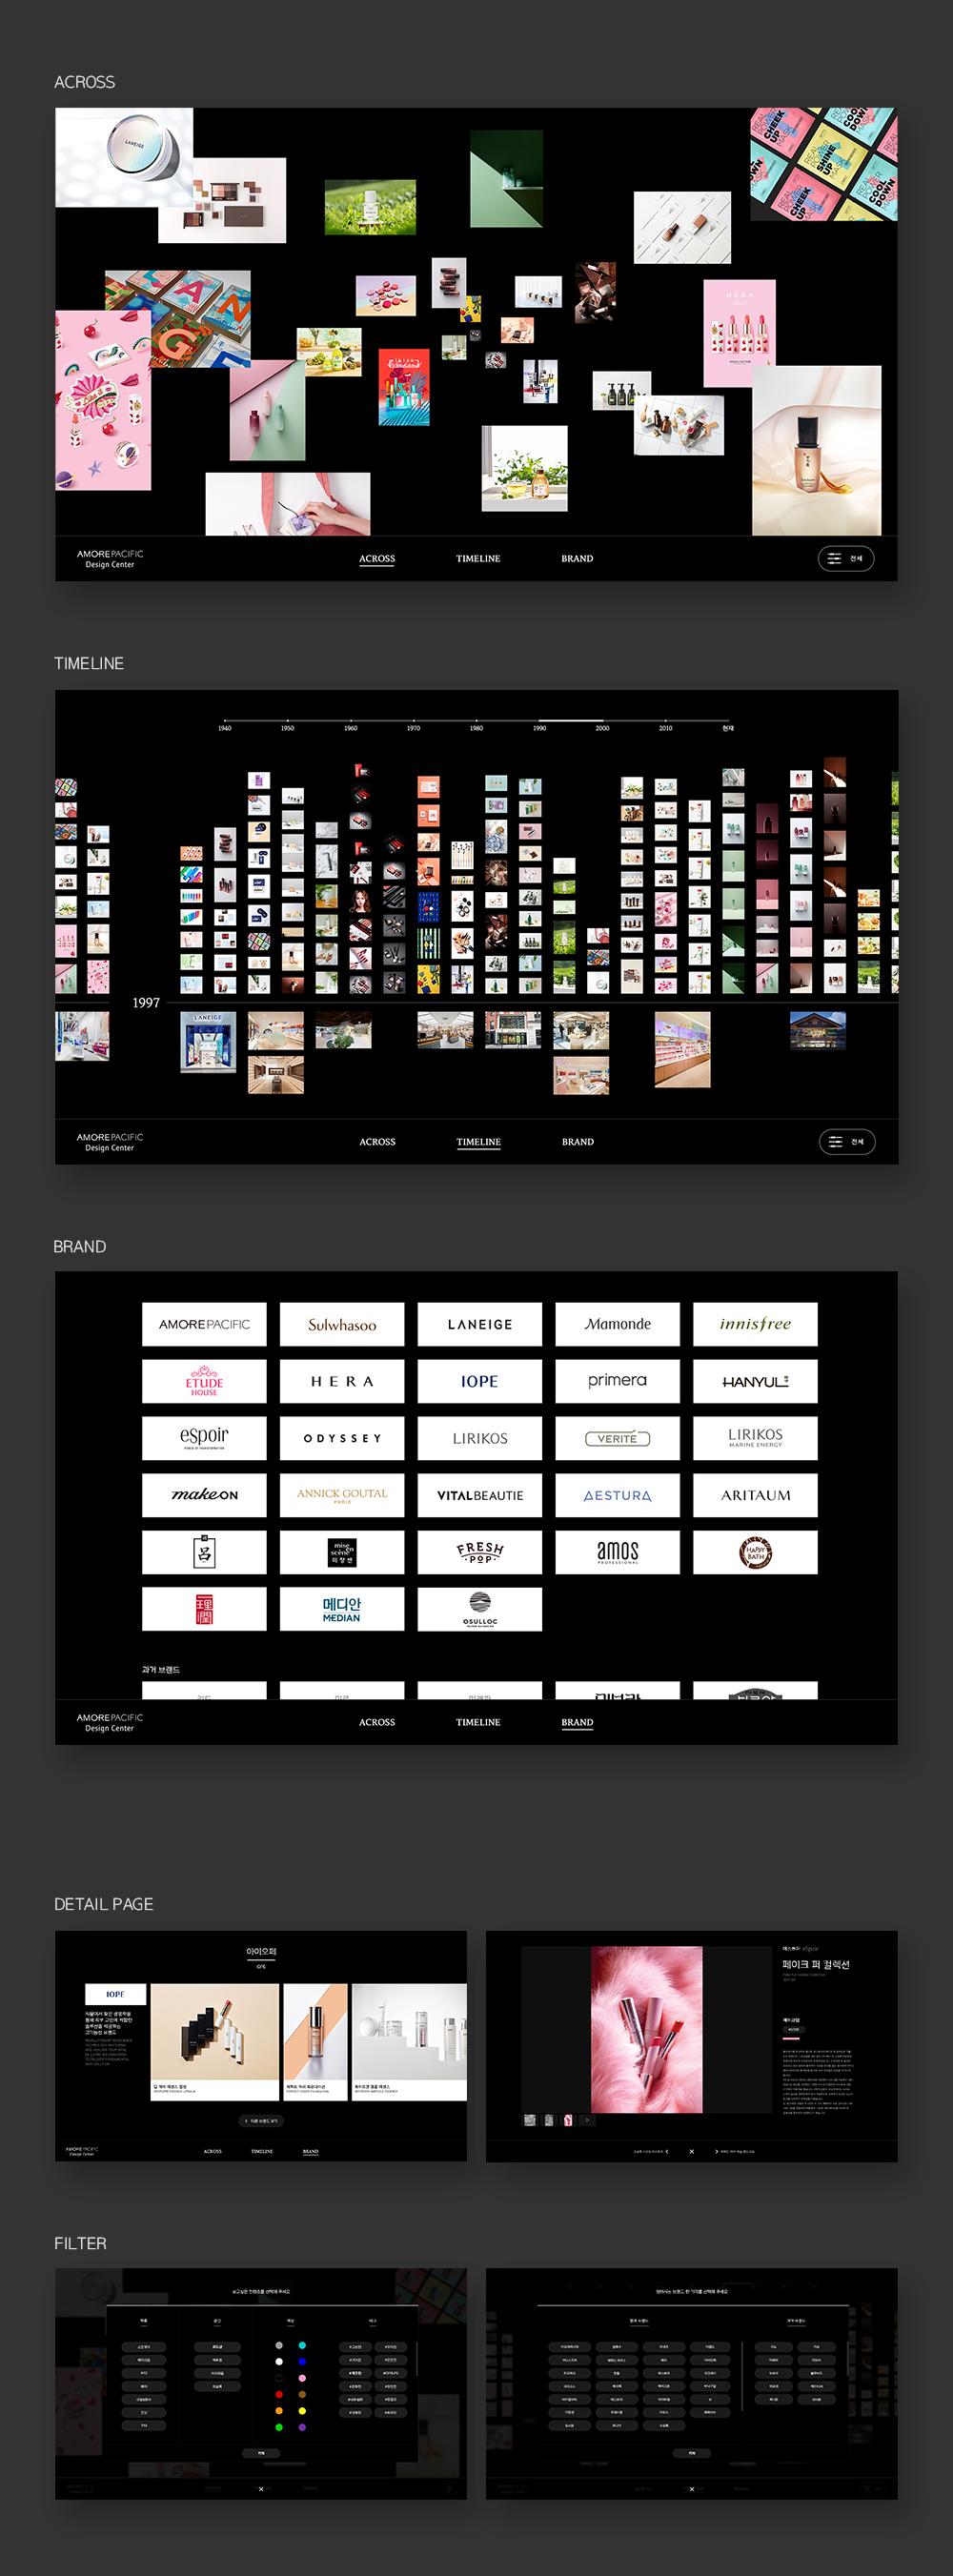 Design-Archive_menu.png